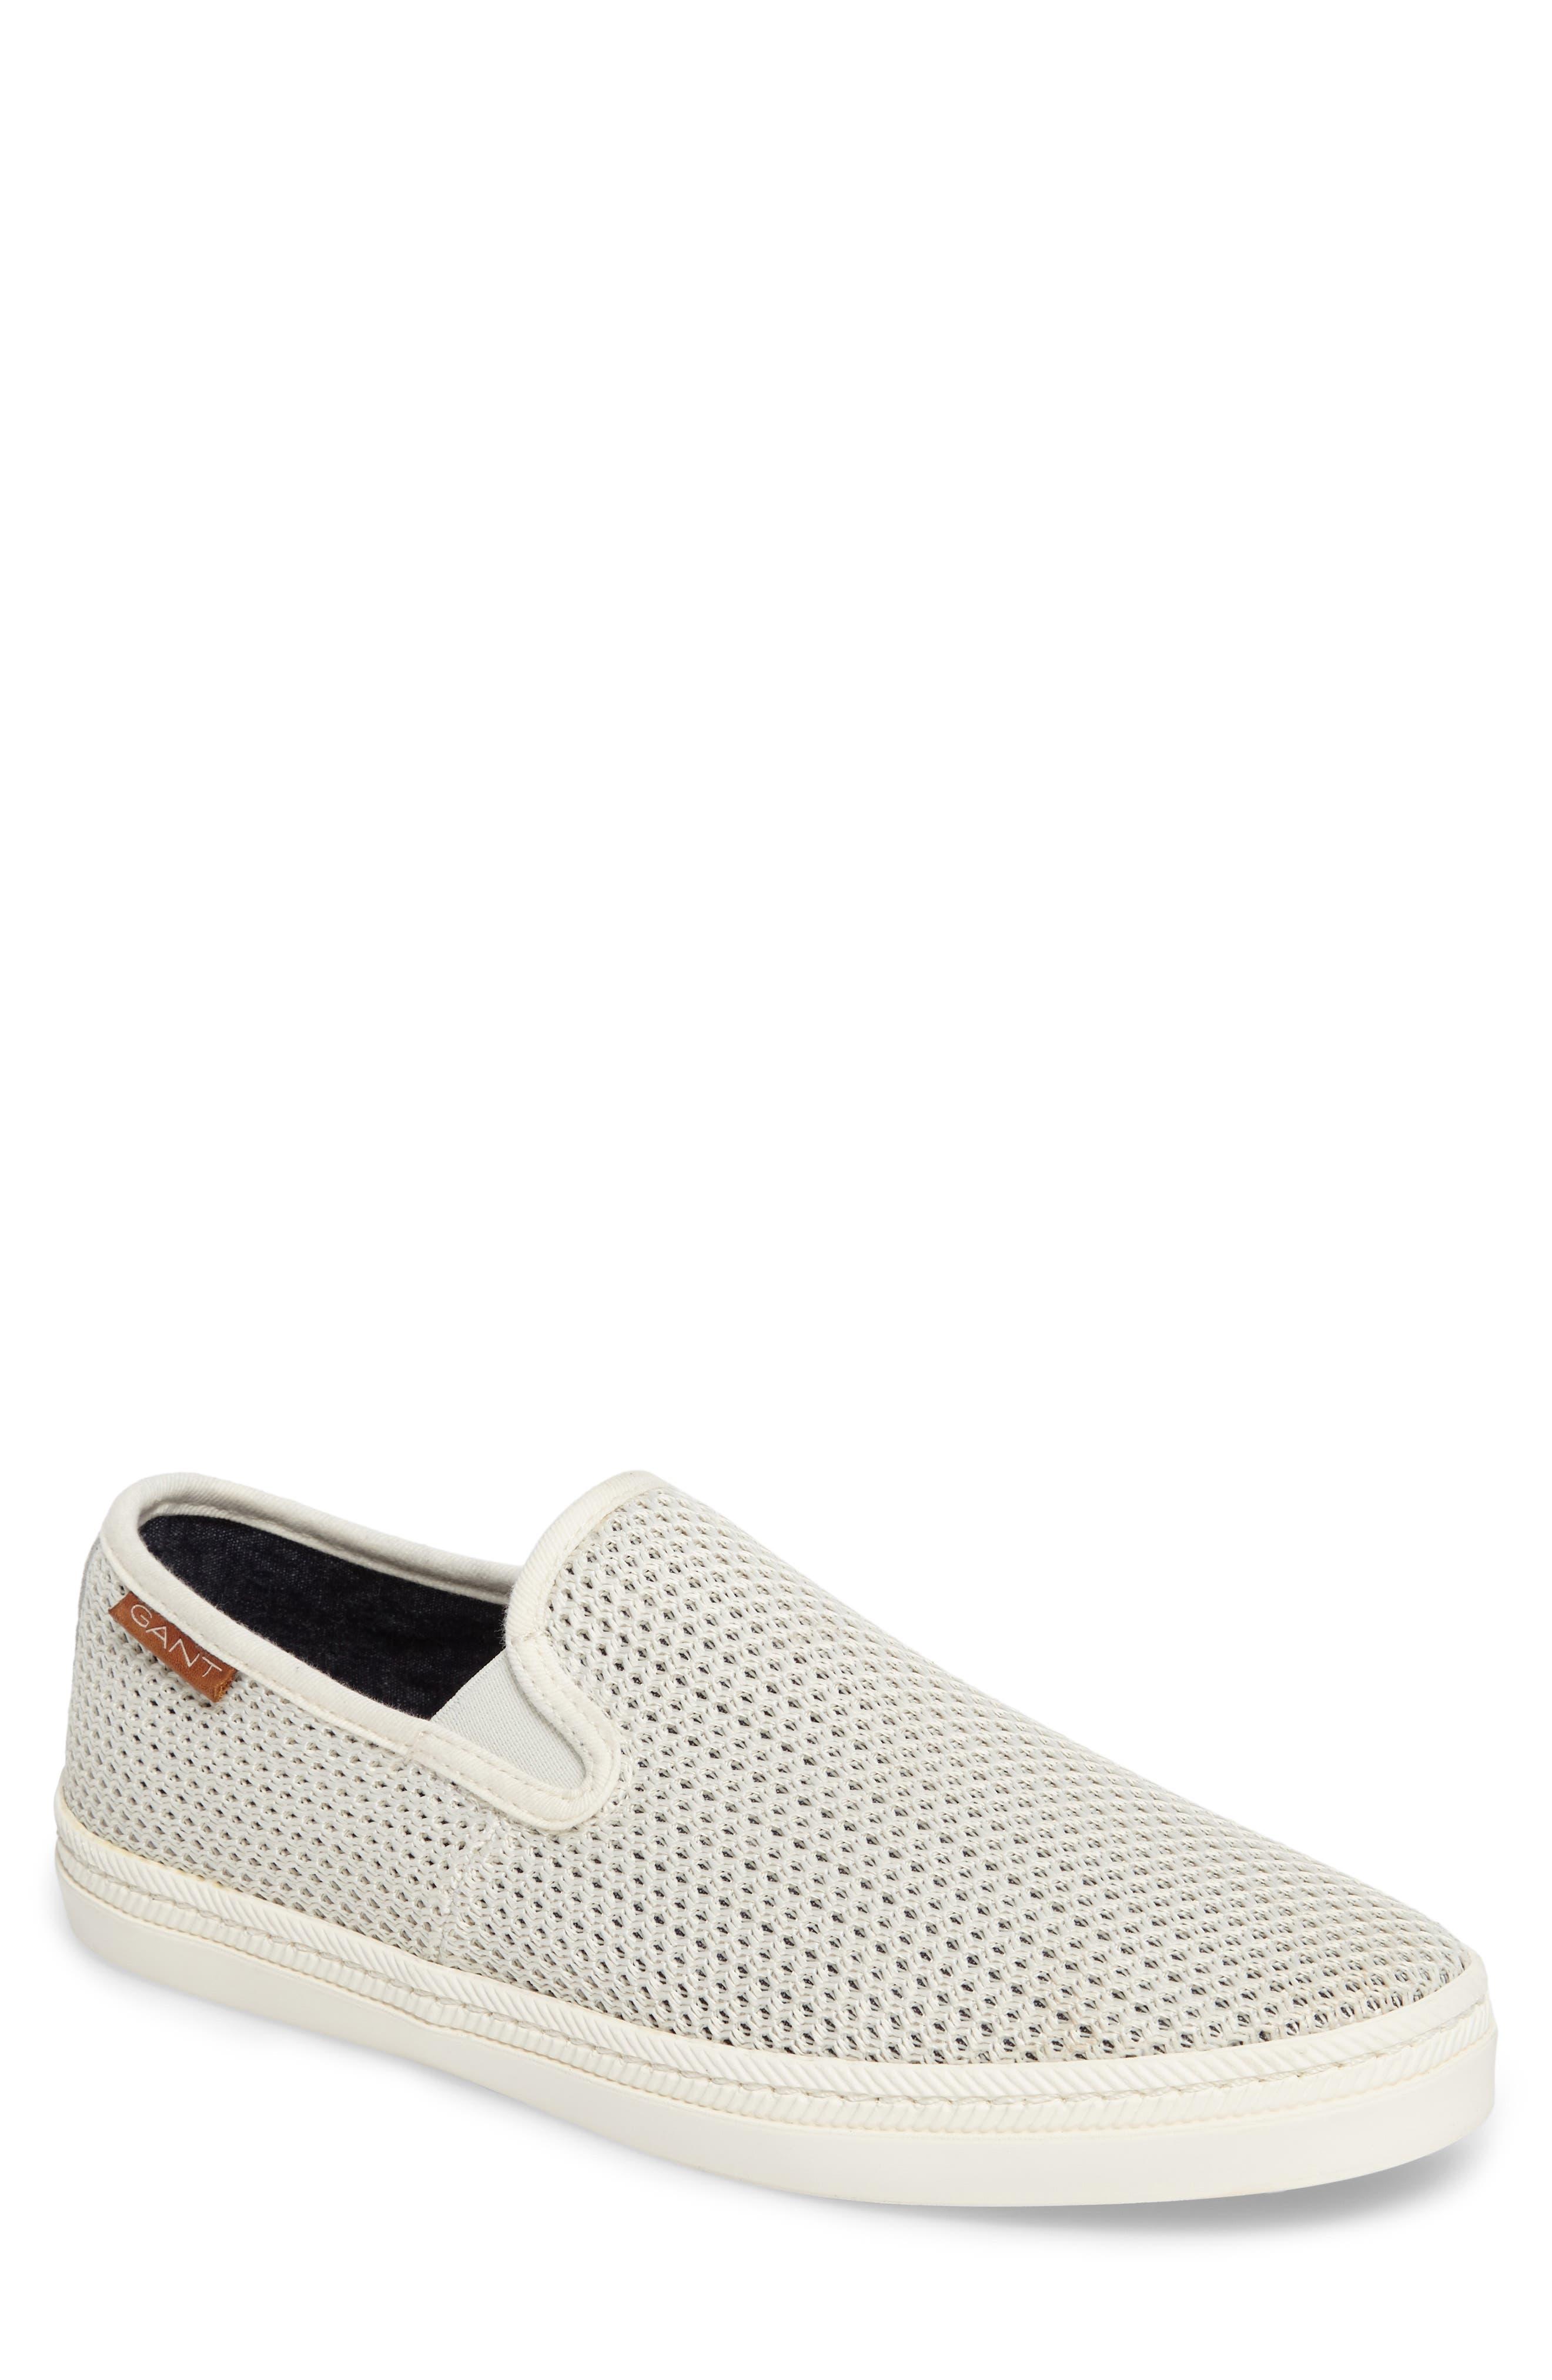 Delray Woven Slip-On Sneaker,                         Main,                         color, Bone Beige Fabric